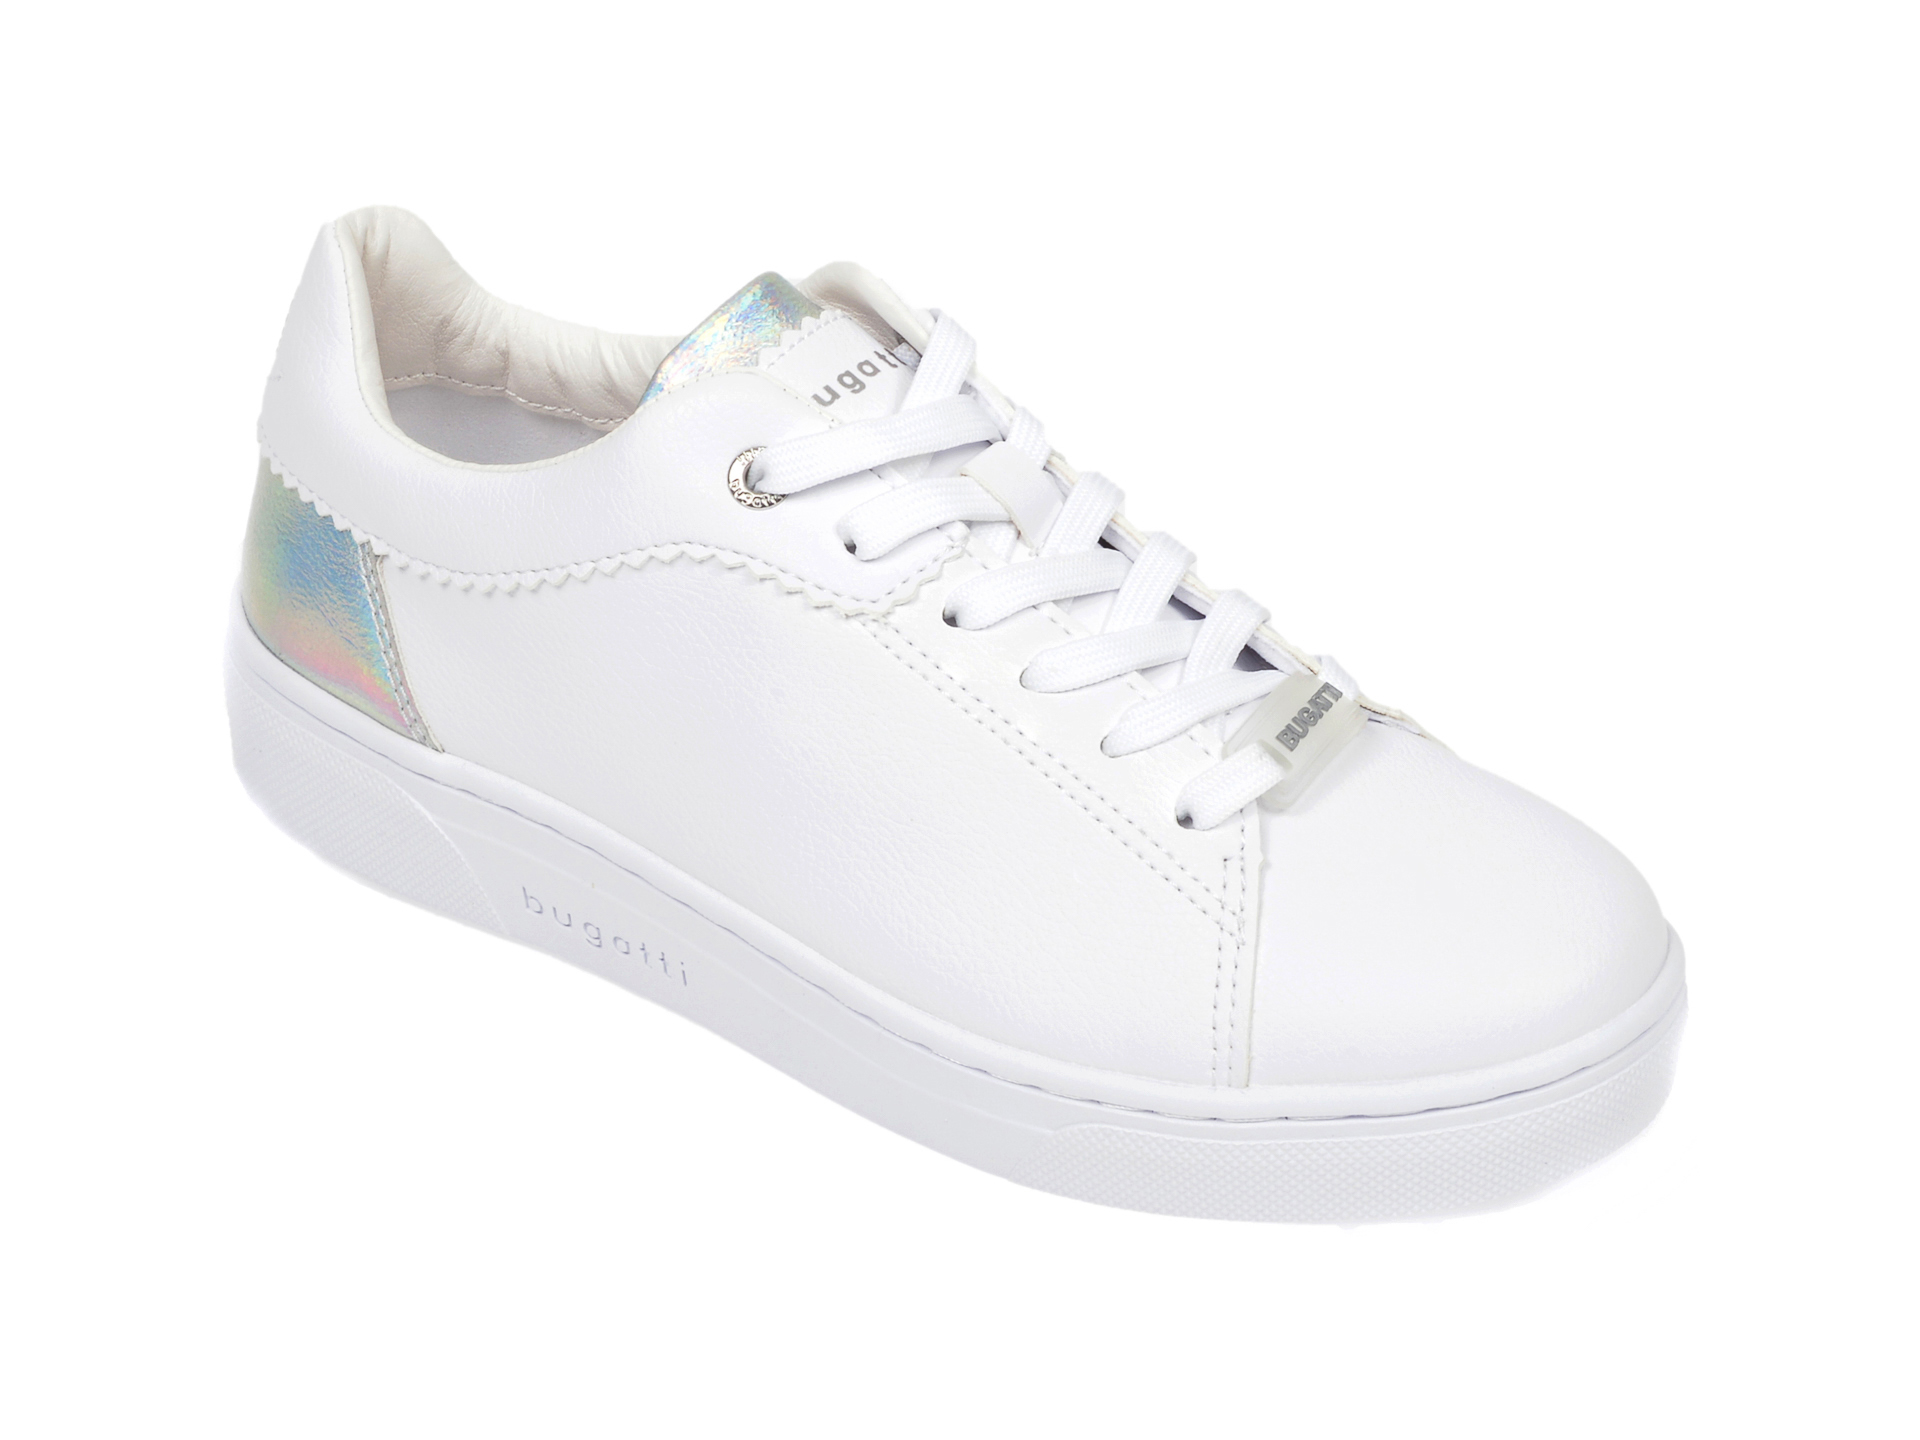 Pantofi sport BUGATTI albi, 87703, din piele ecologica imagine